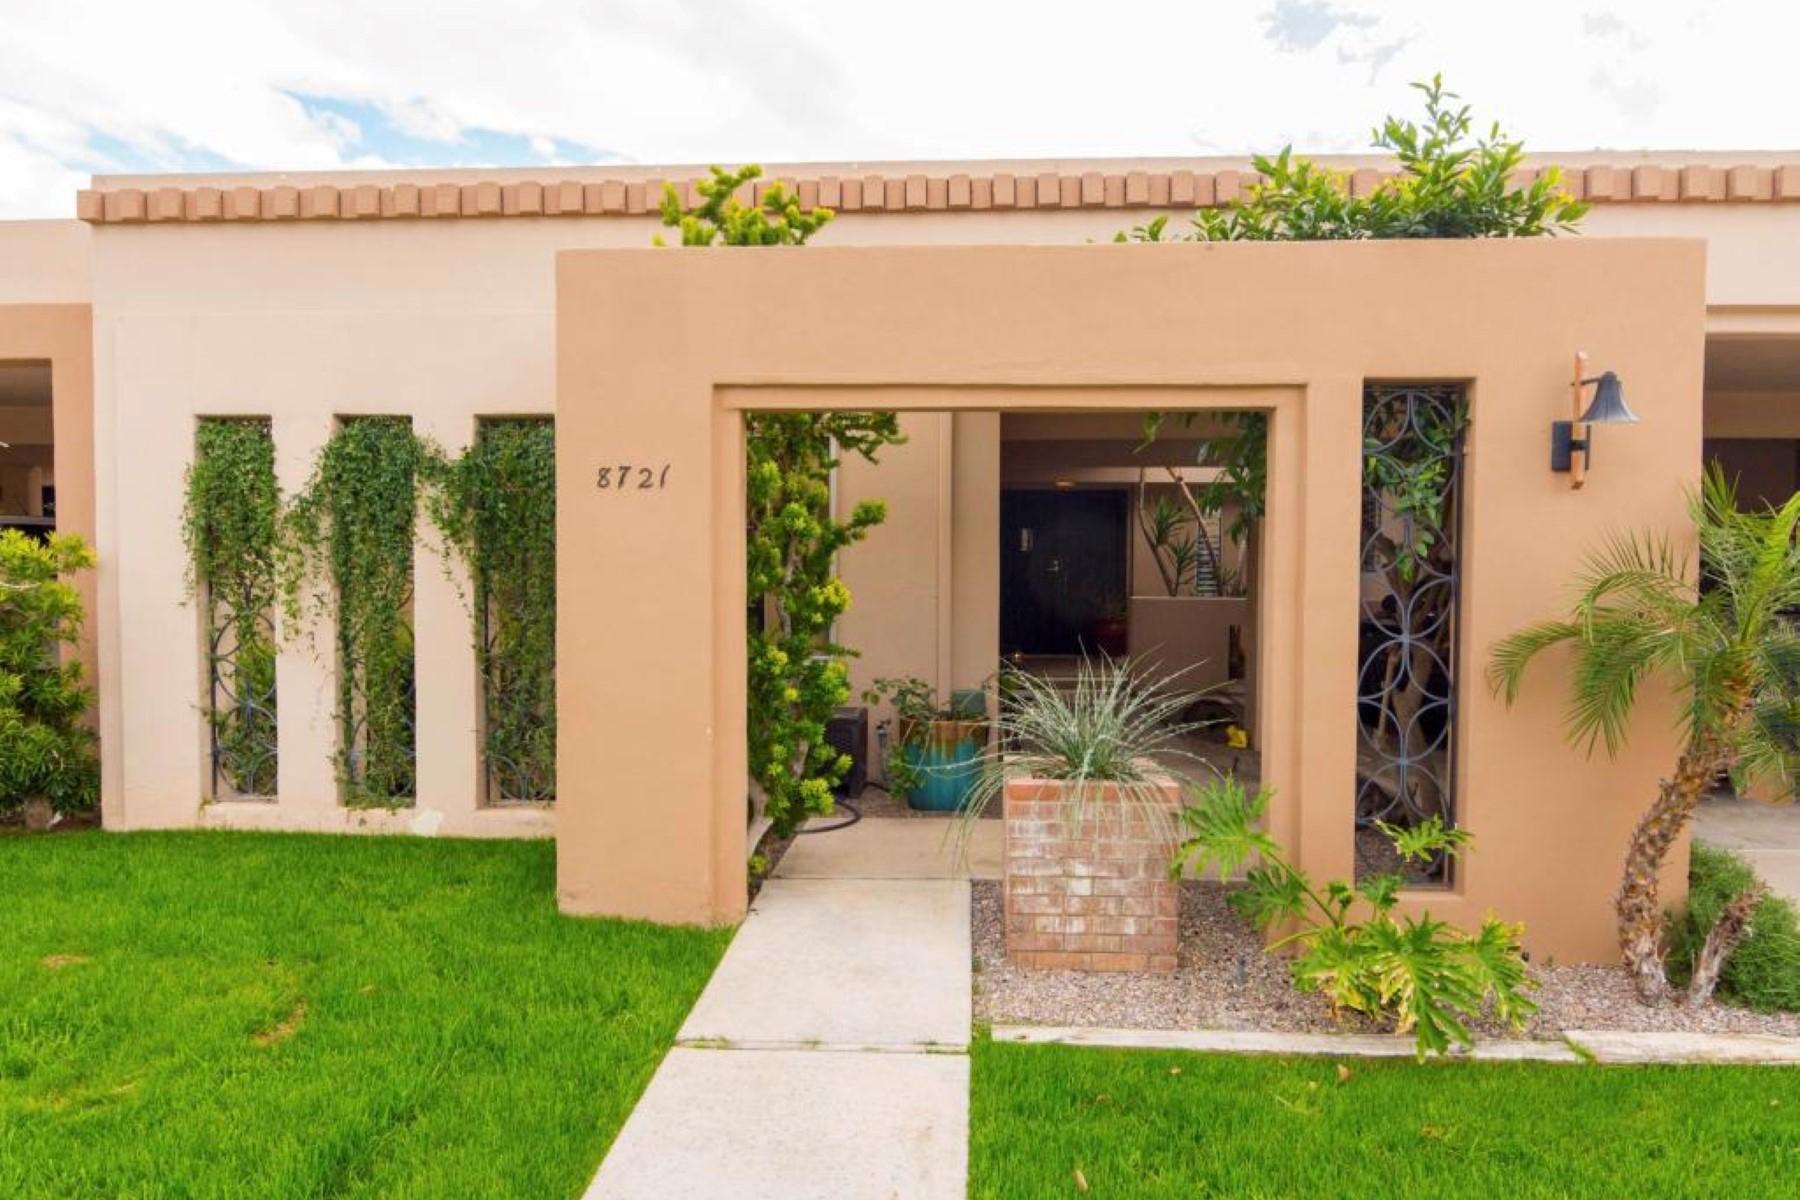 Residência urbana para Venda às Wonderful Sands Scottsdale Townhome 8721 E Via de Viva Scottsdale, Arizona 85258 Estados Unidos